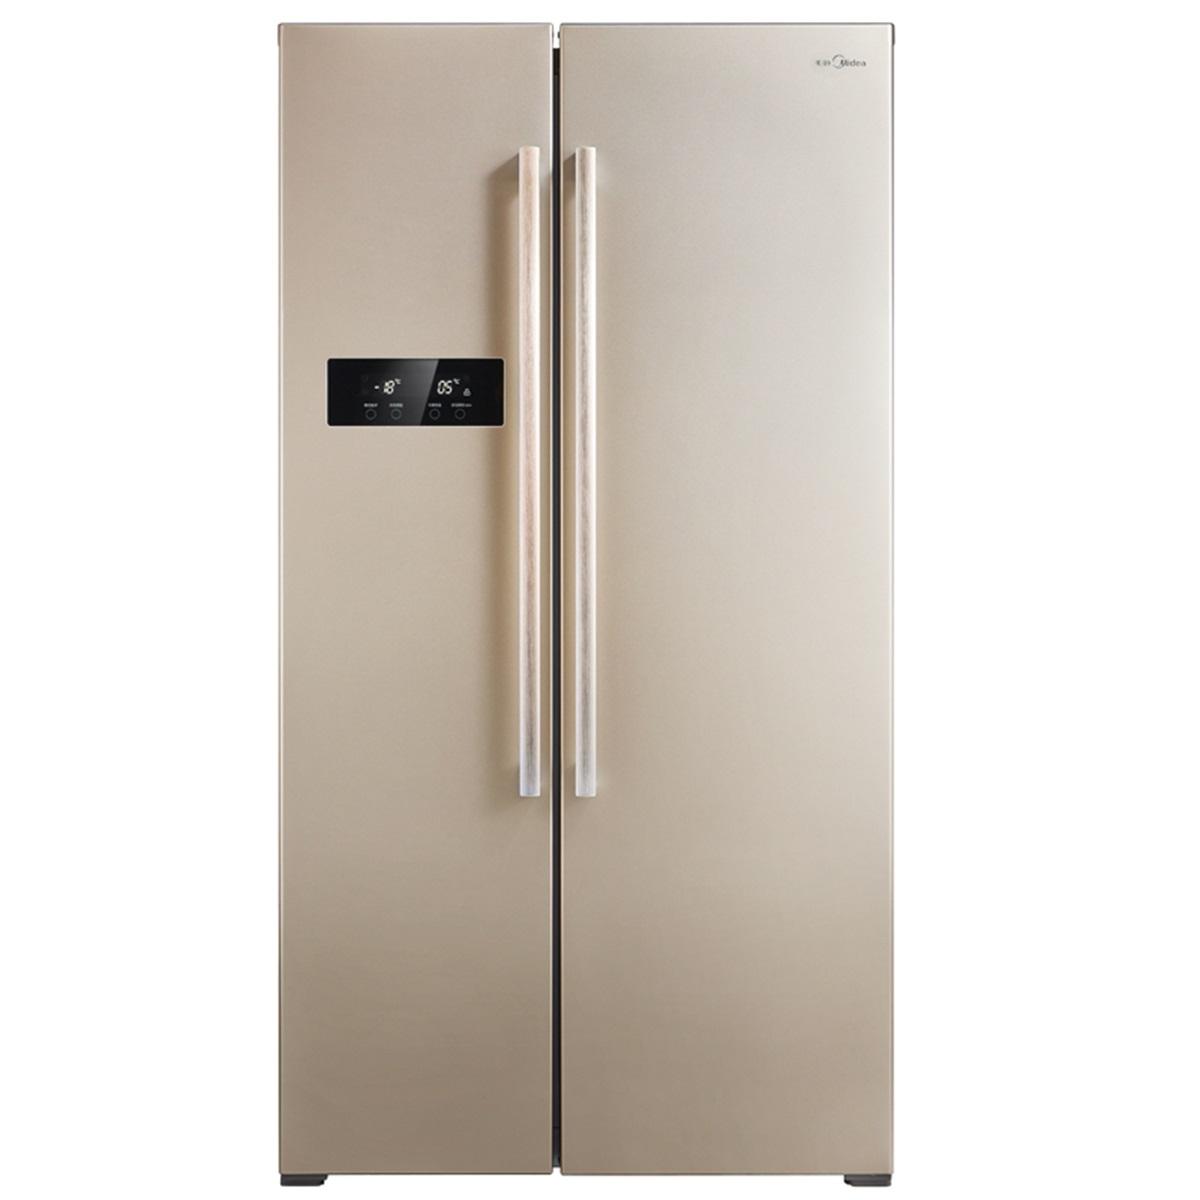 Midea/美的 610WKM(E)冰箱 说明书.pdf